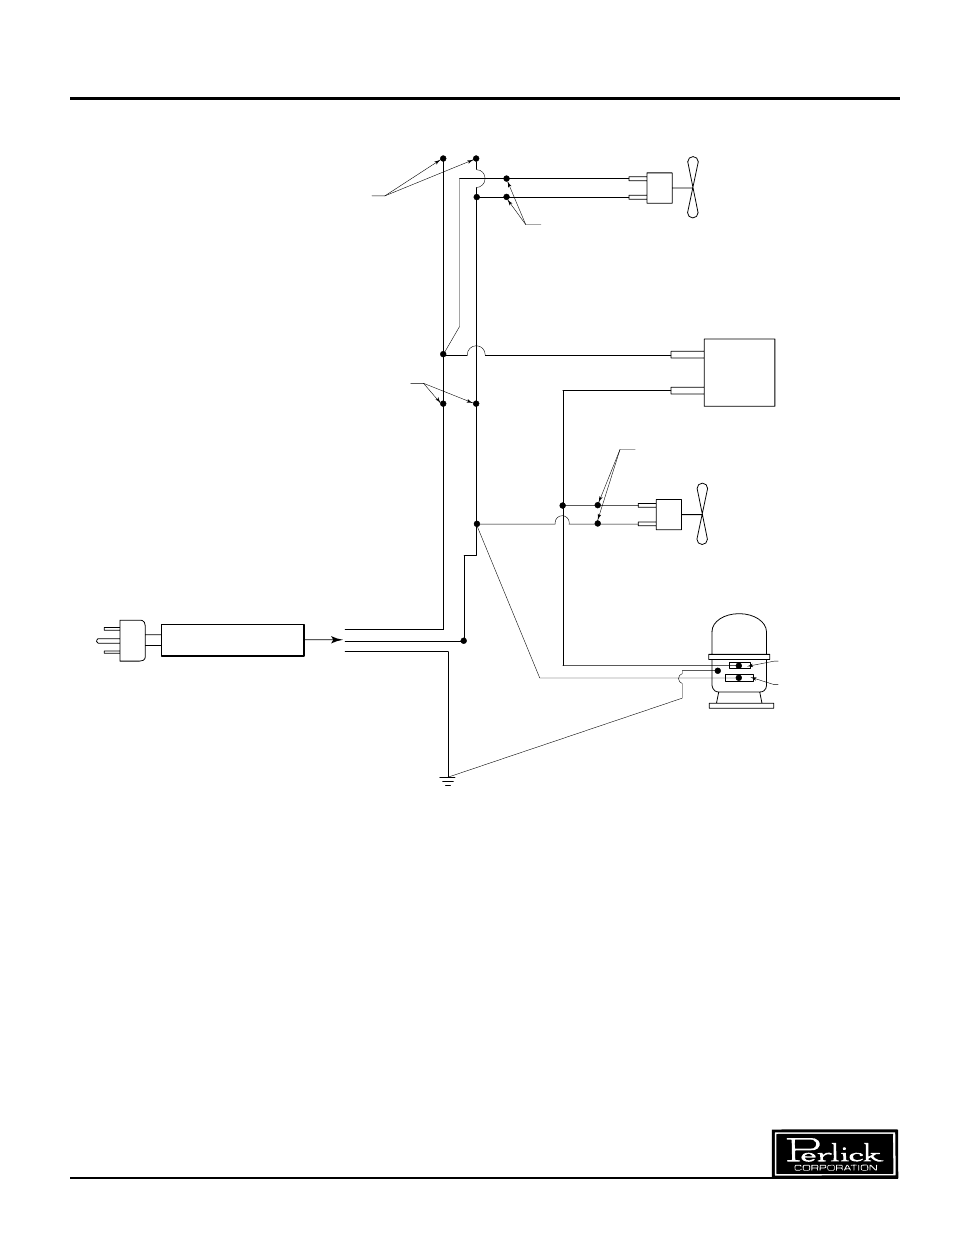 wiring diagram single door refrigerator perlick r24n user manual rh manualsdir com 3-Way Switch Wiring Diagram Basic Electrical Wiring Diagrams